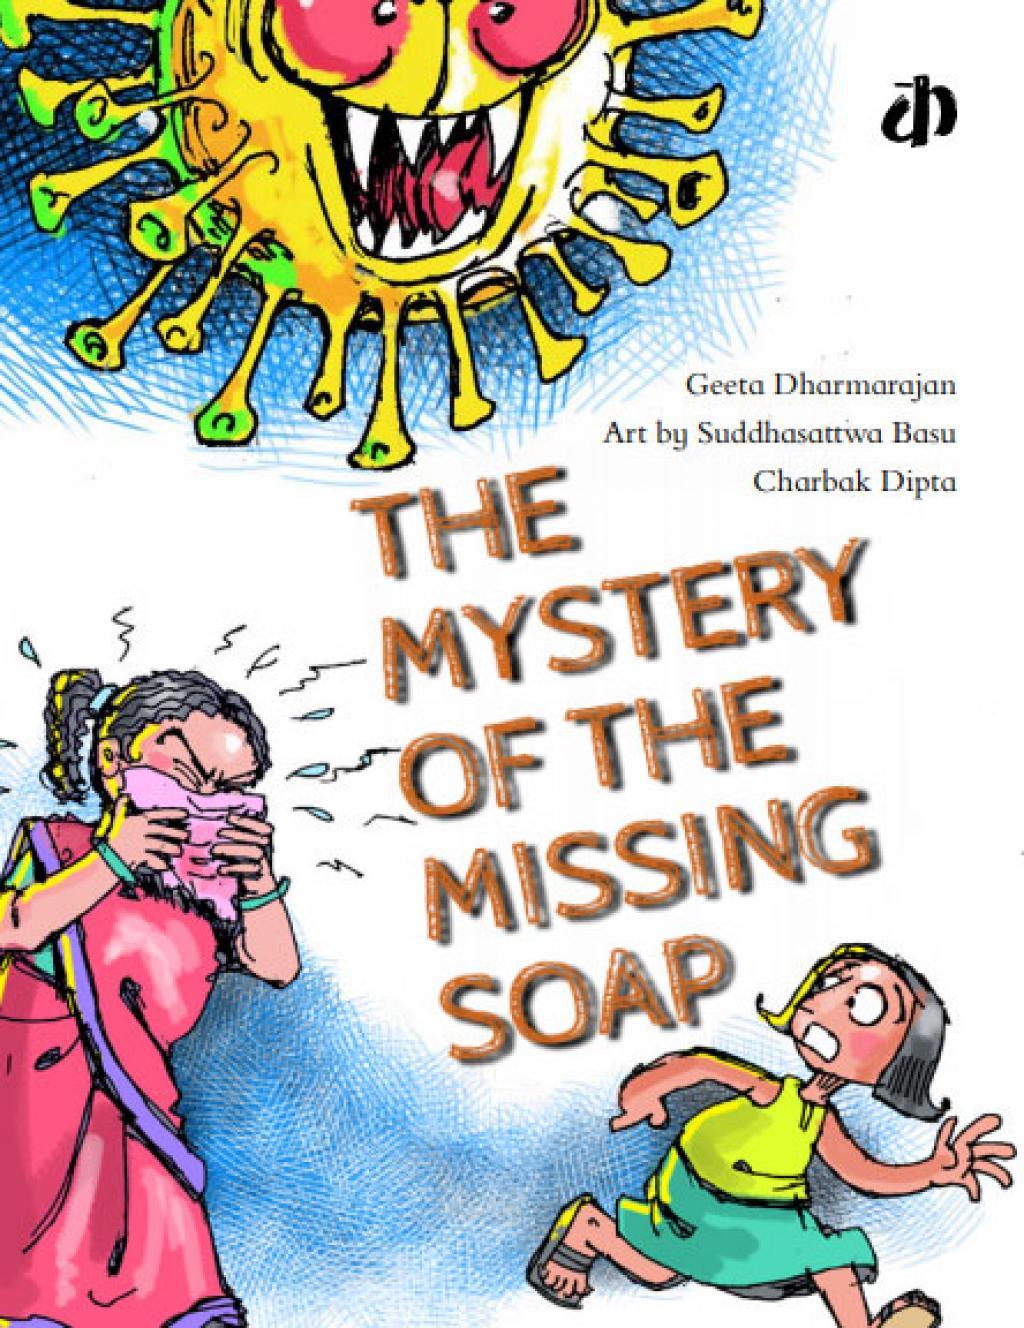 Katha's latest e-book on corona won't scare you away, says Geeta Dharmarajan